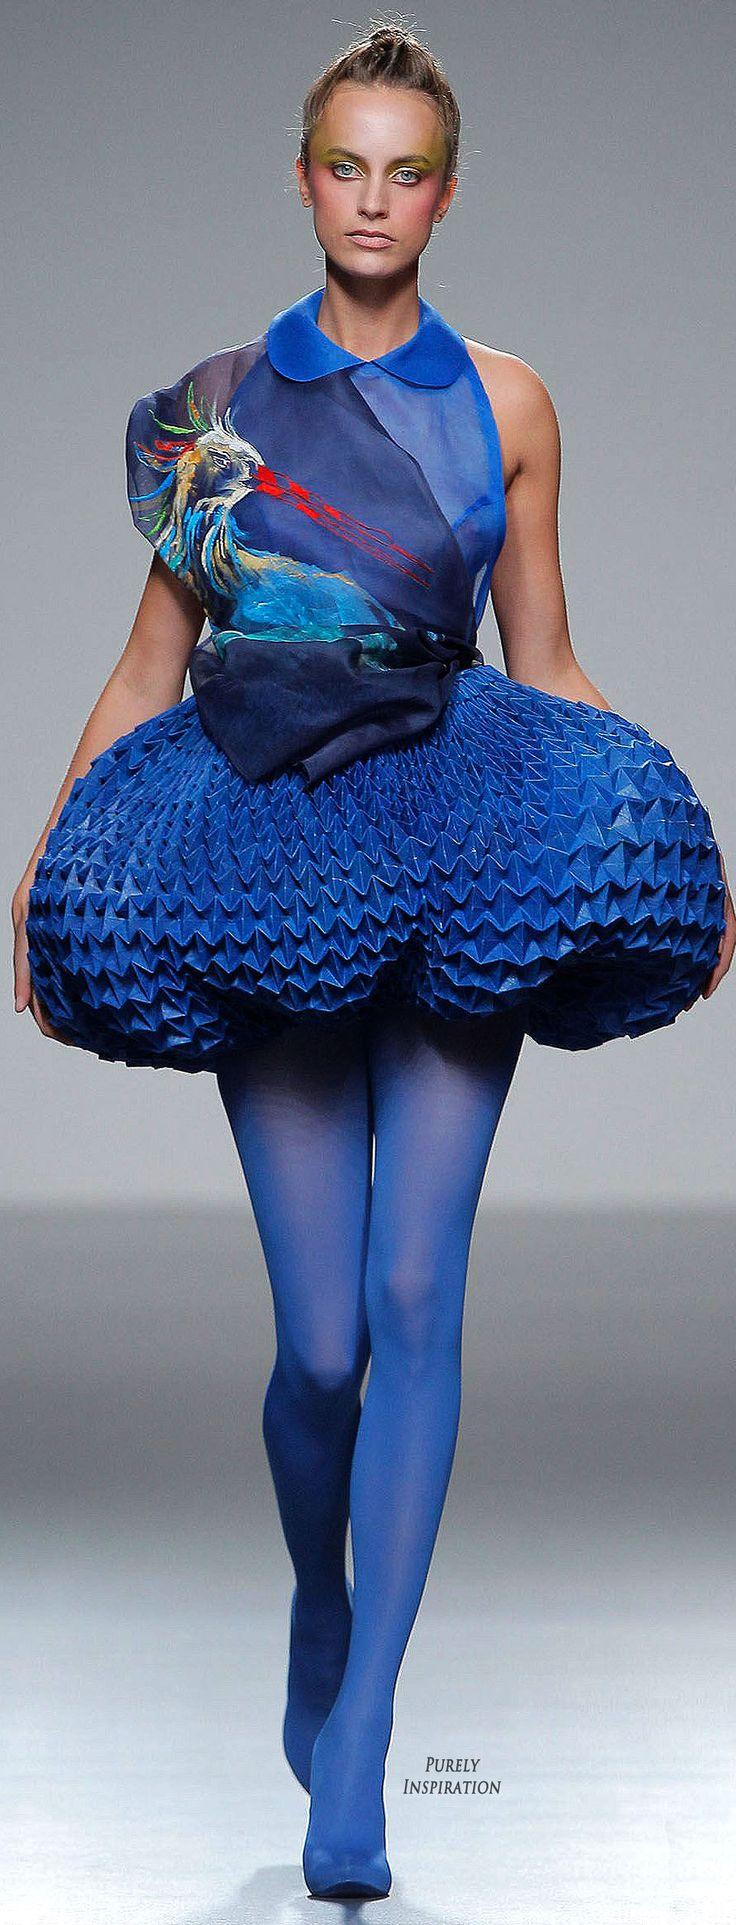 Eva Soto Conde Origami Collection 2012 Women's Avant-garde Fashion | Purely Inspiration